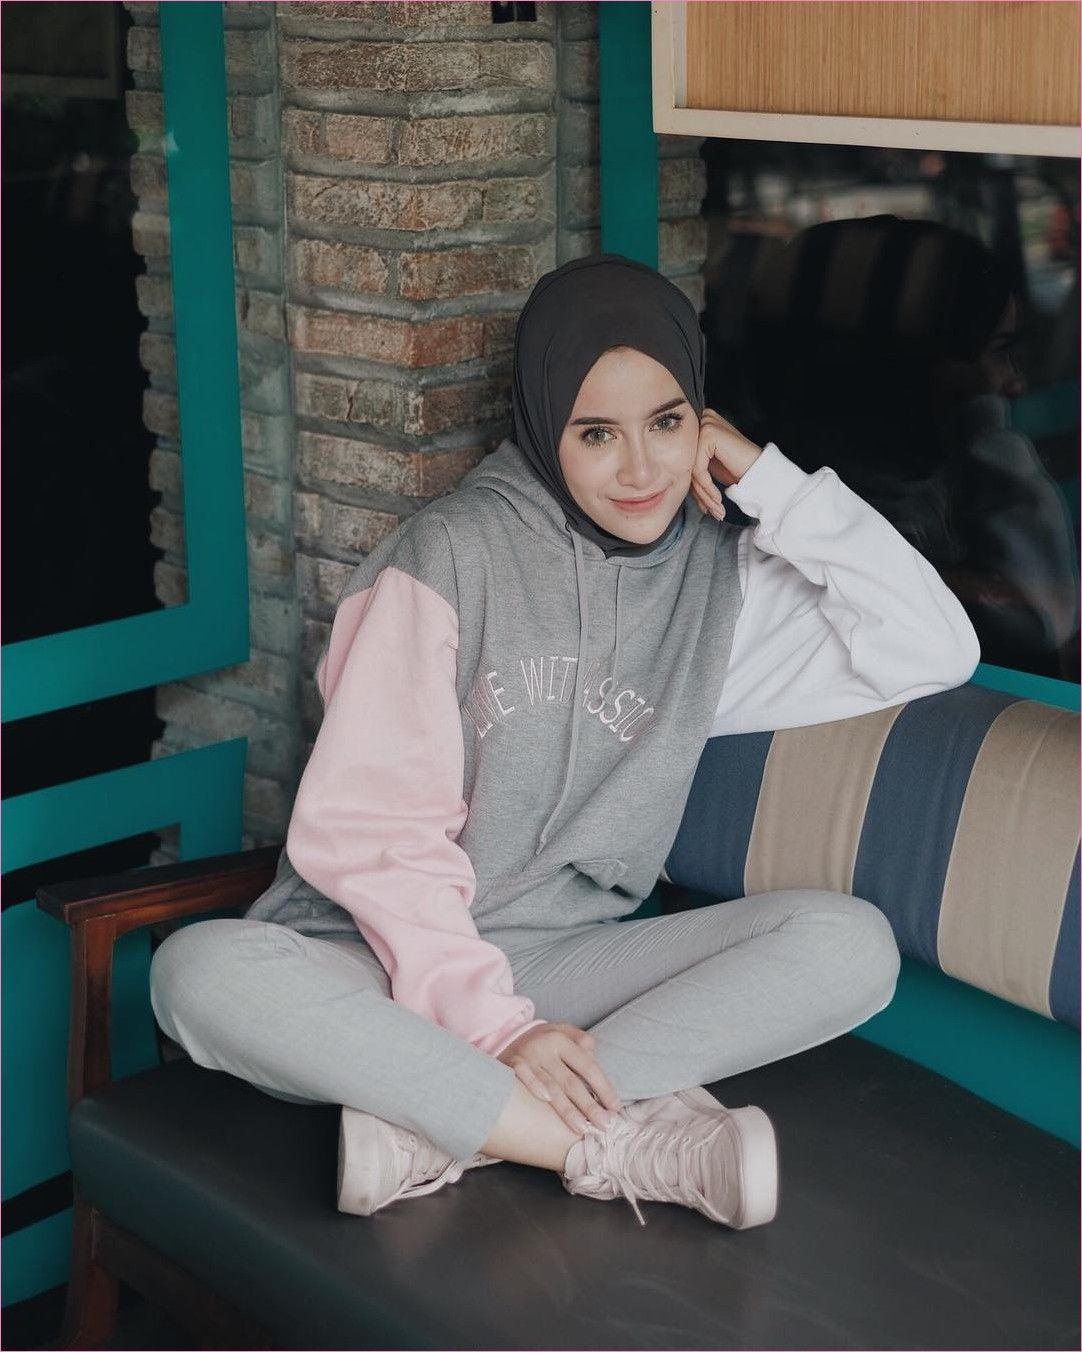 Outfit Baju Hijab Casual Untuk Olahraga Ala Selebgram 2018 Sneakers Kets Sepatu Olahraga Turban Jaket Hoodi Baju Olahraga Wanita Pakaian Olahraga Baju Olahraga